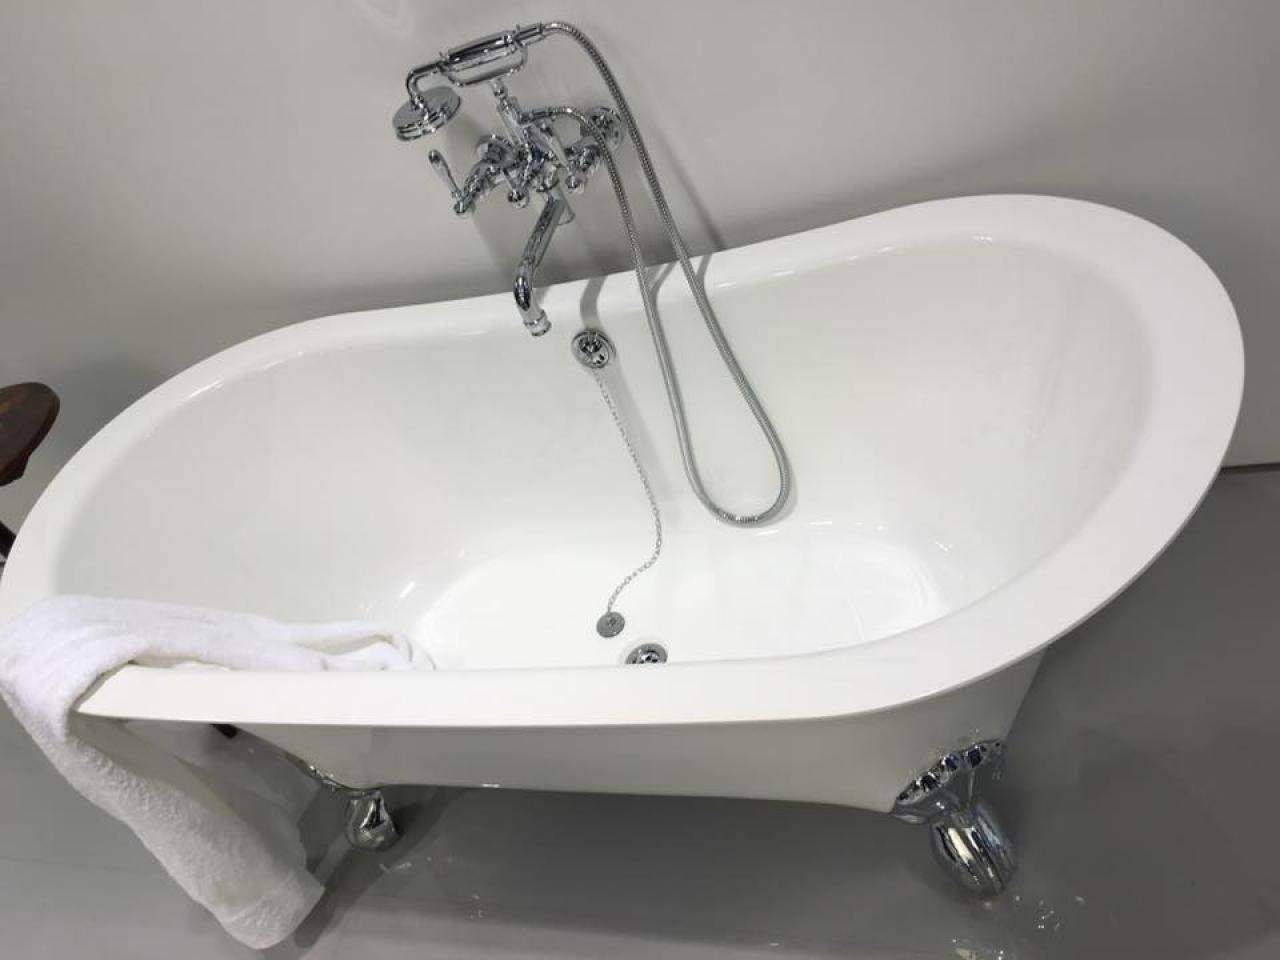 Vasca Da Bagno Zampe Di Leone : La vasca da bagno a vicenza fratelli pellizzari